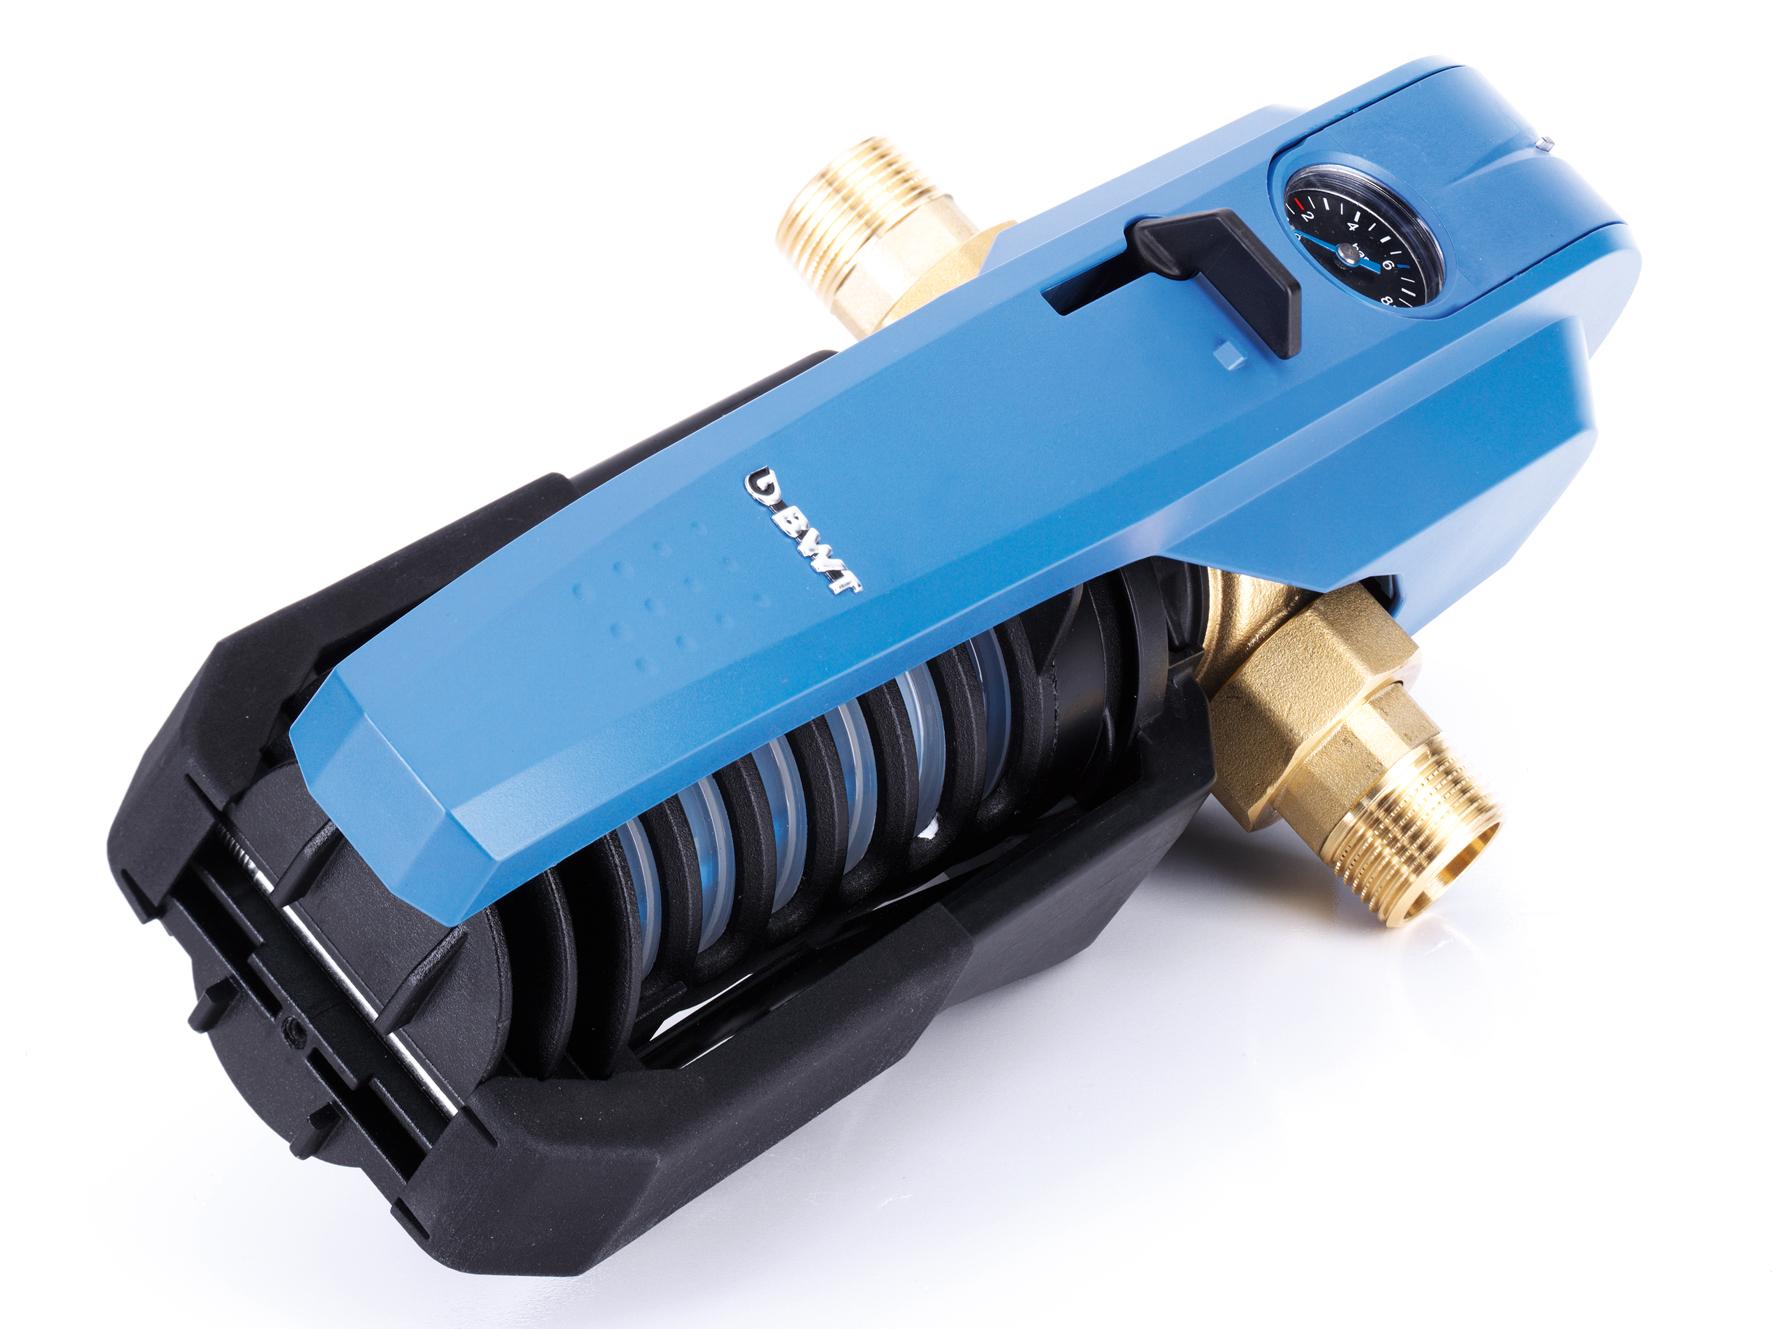 BWT E1 ivóvíz vízszűrő